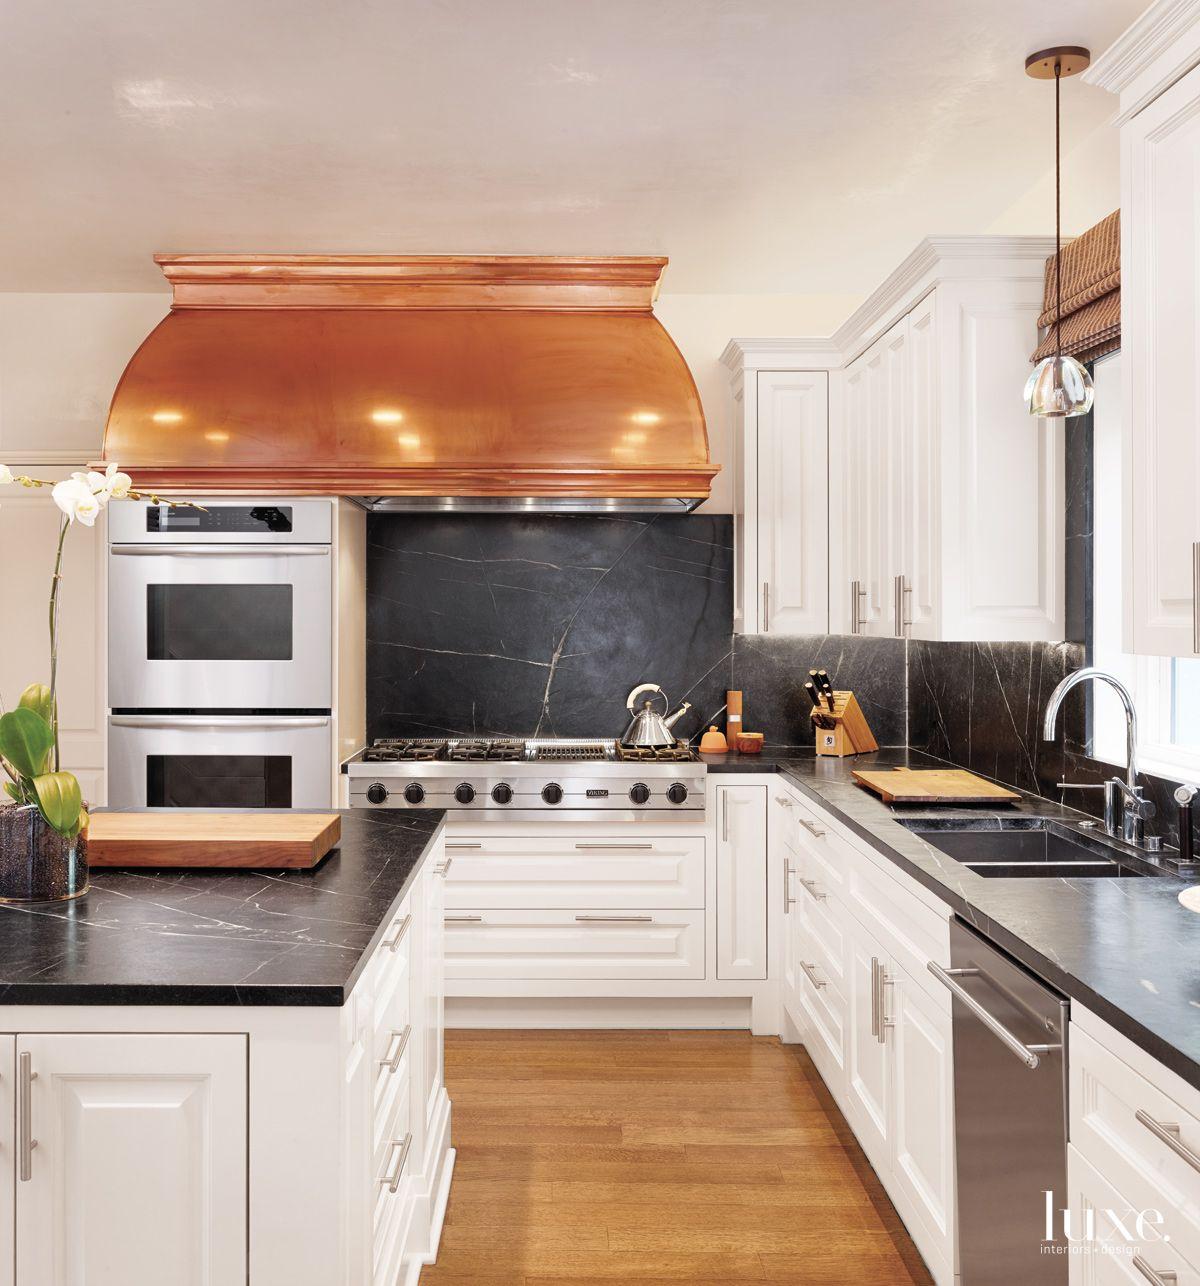 Modern White Kitchen with Soapstone Backsplash